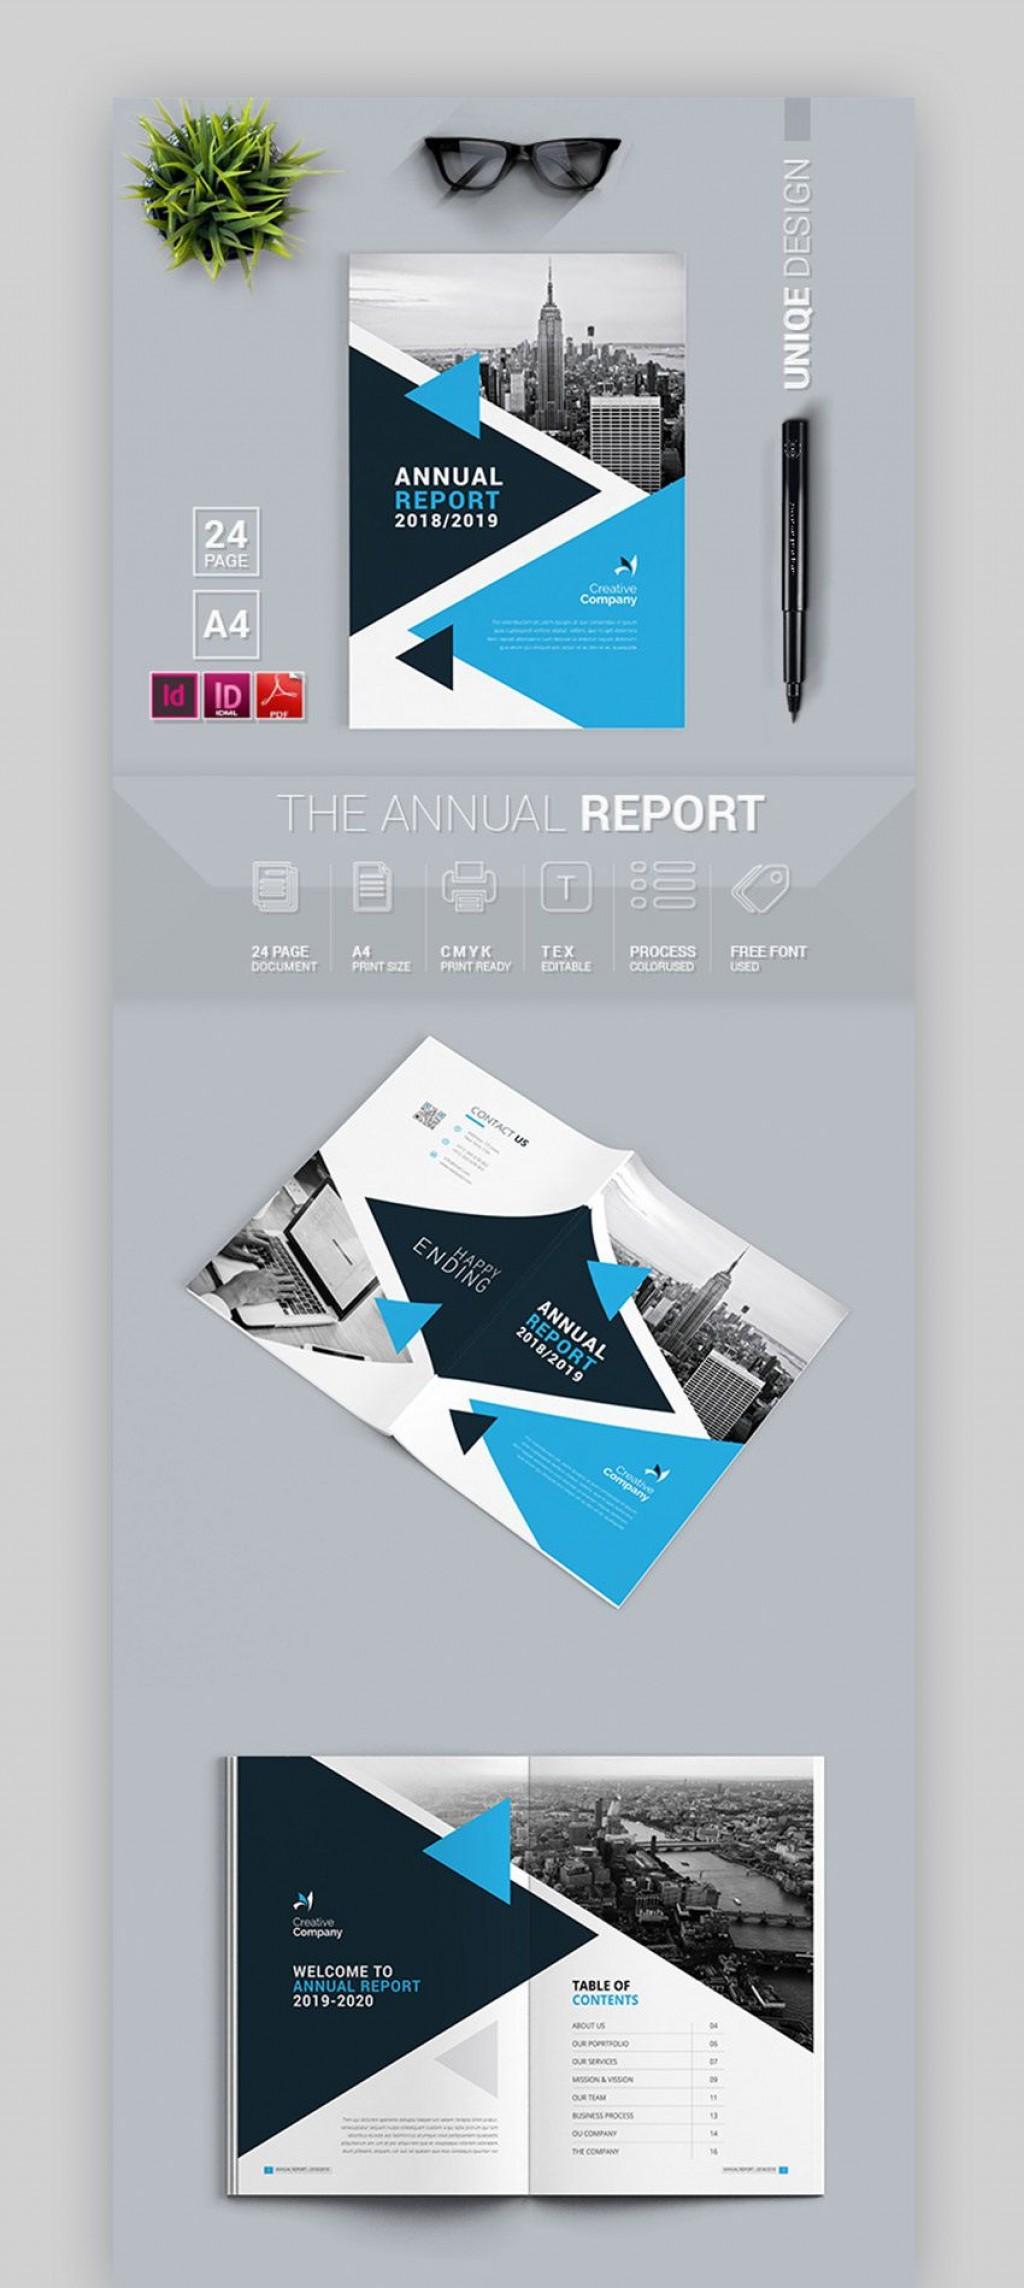 001 Fascinating Annual Report Design Template Indesign  Free DownloadLarge